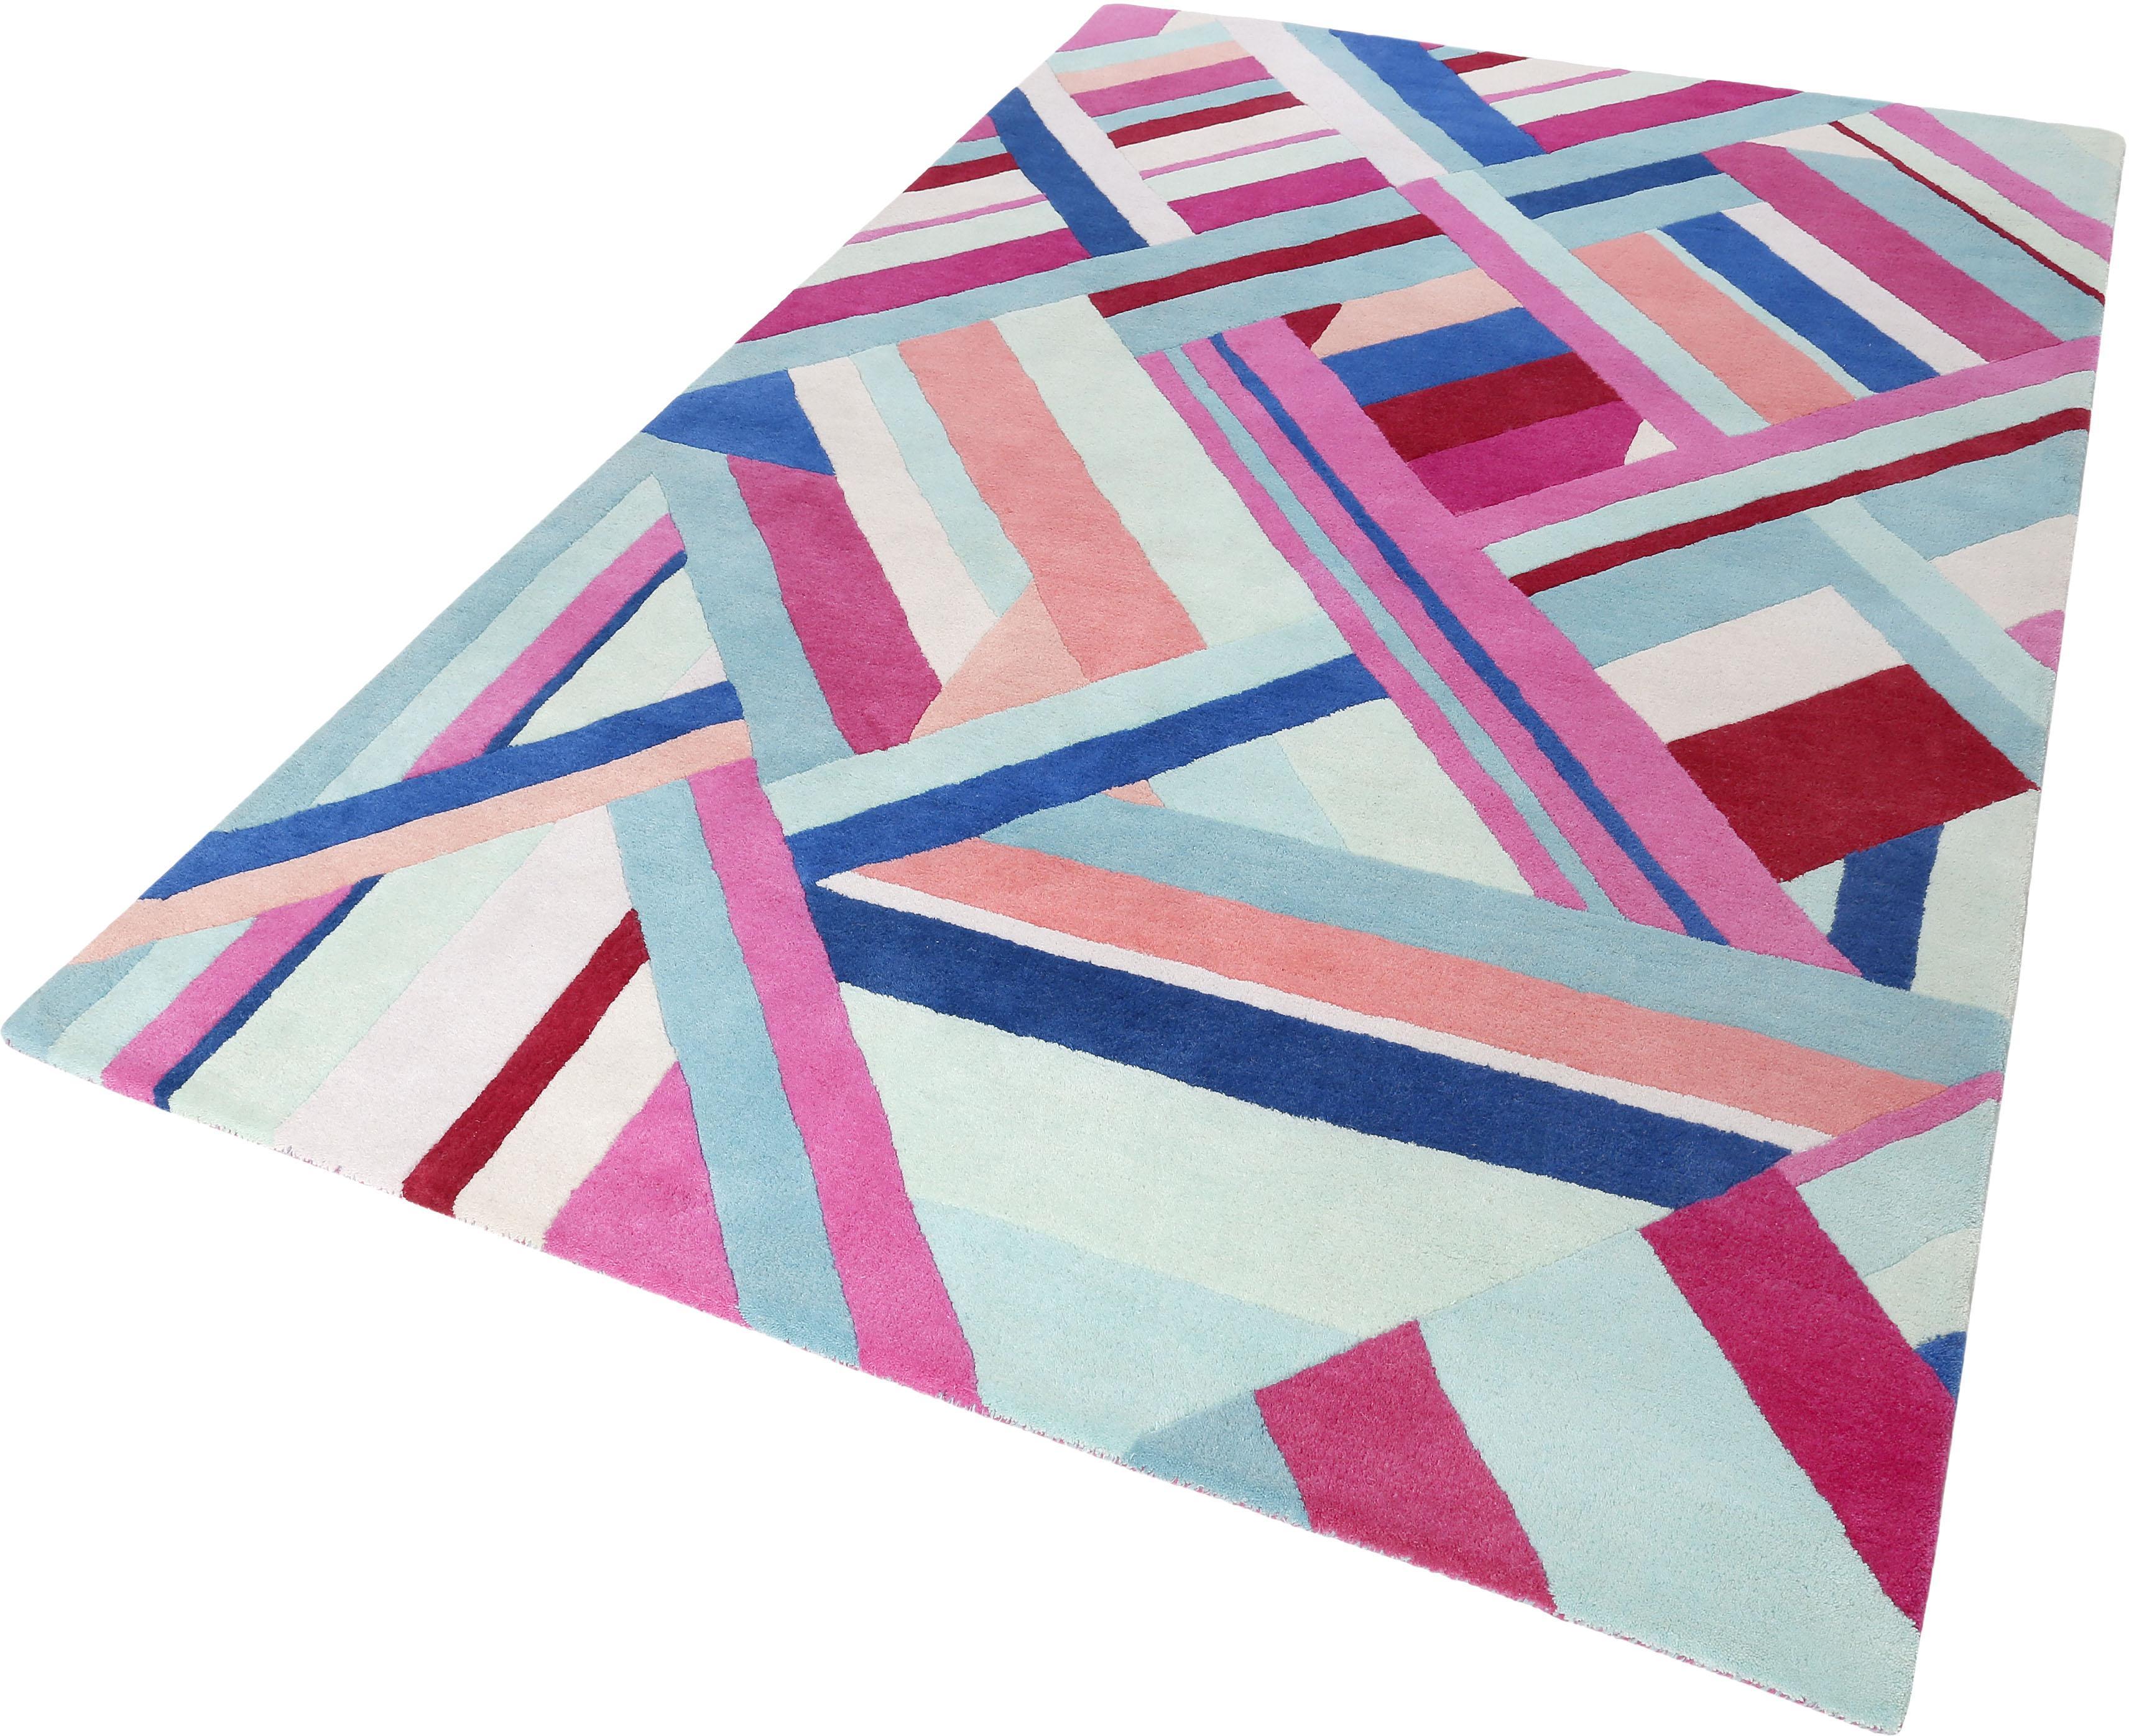 Teppich Linear Accessorize Home rechteckig Höhe 16 mm handgetuftet